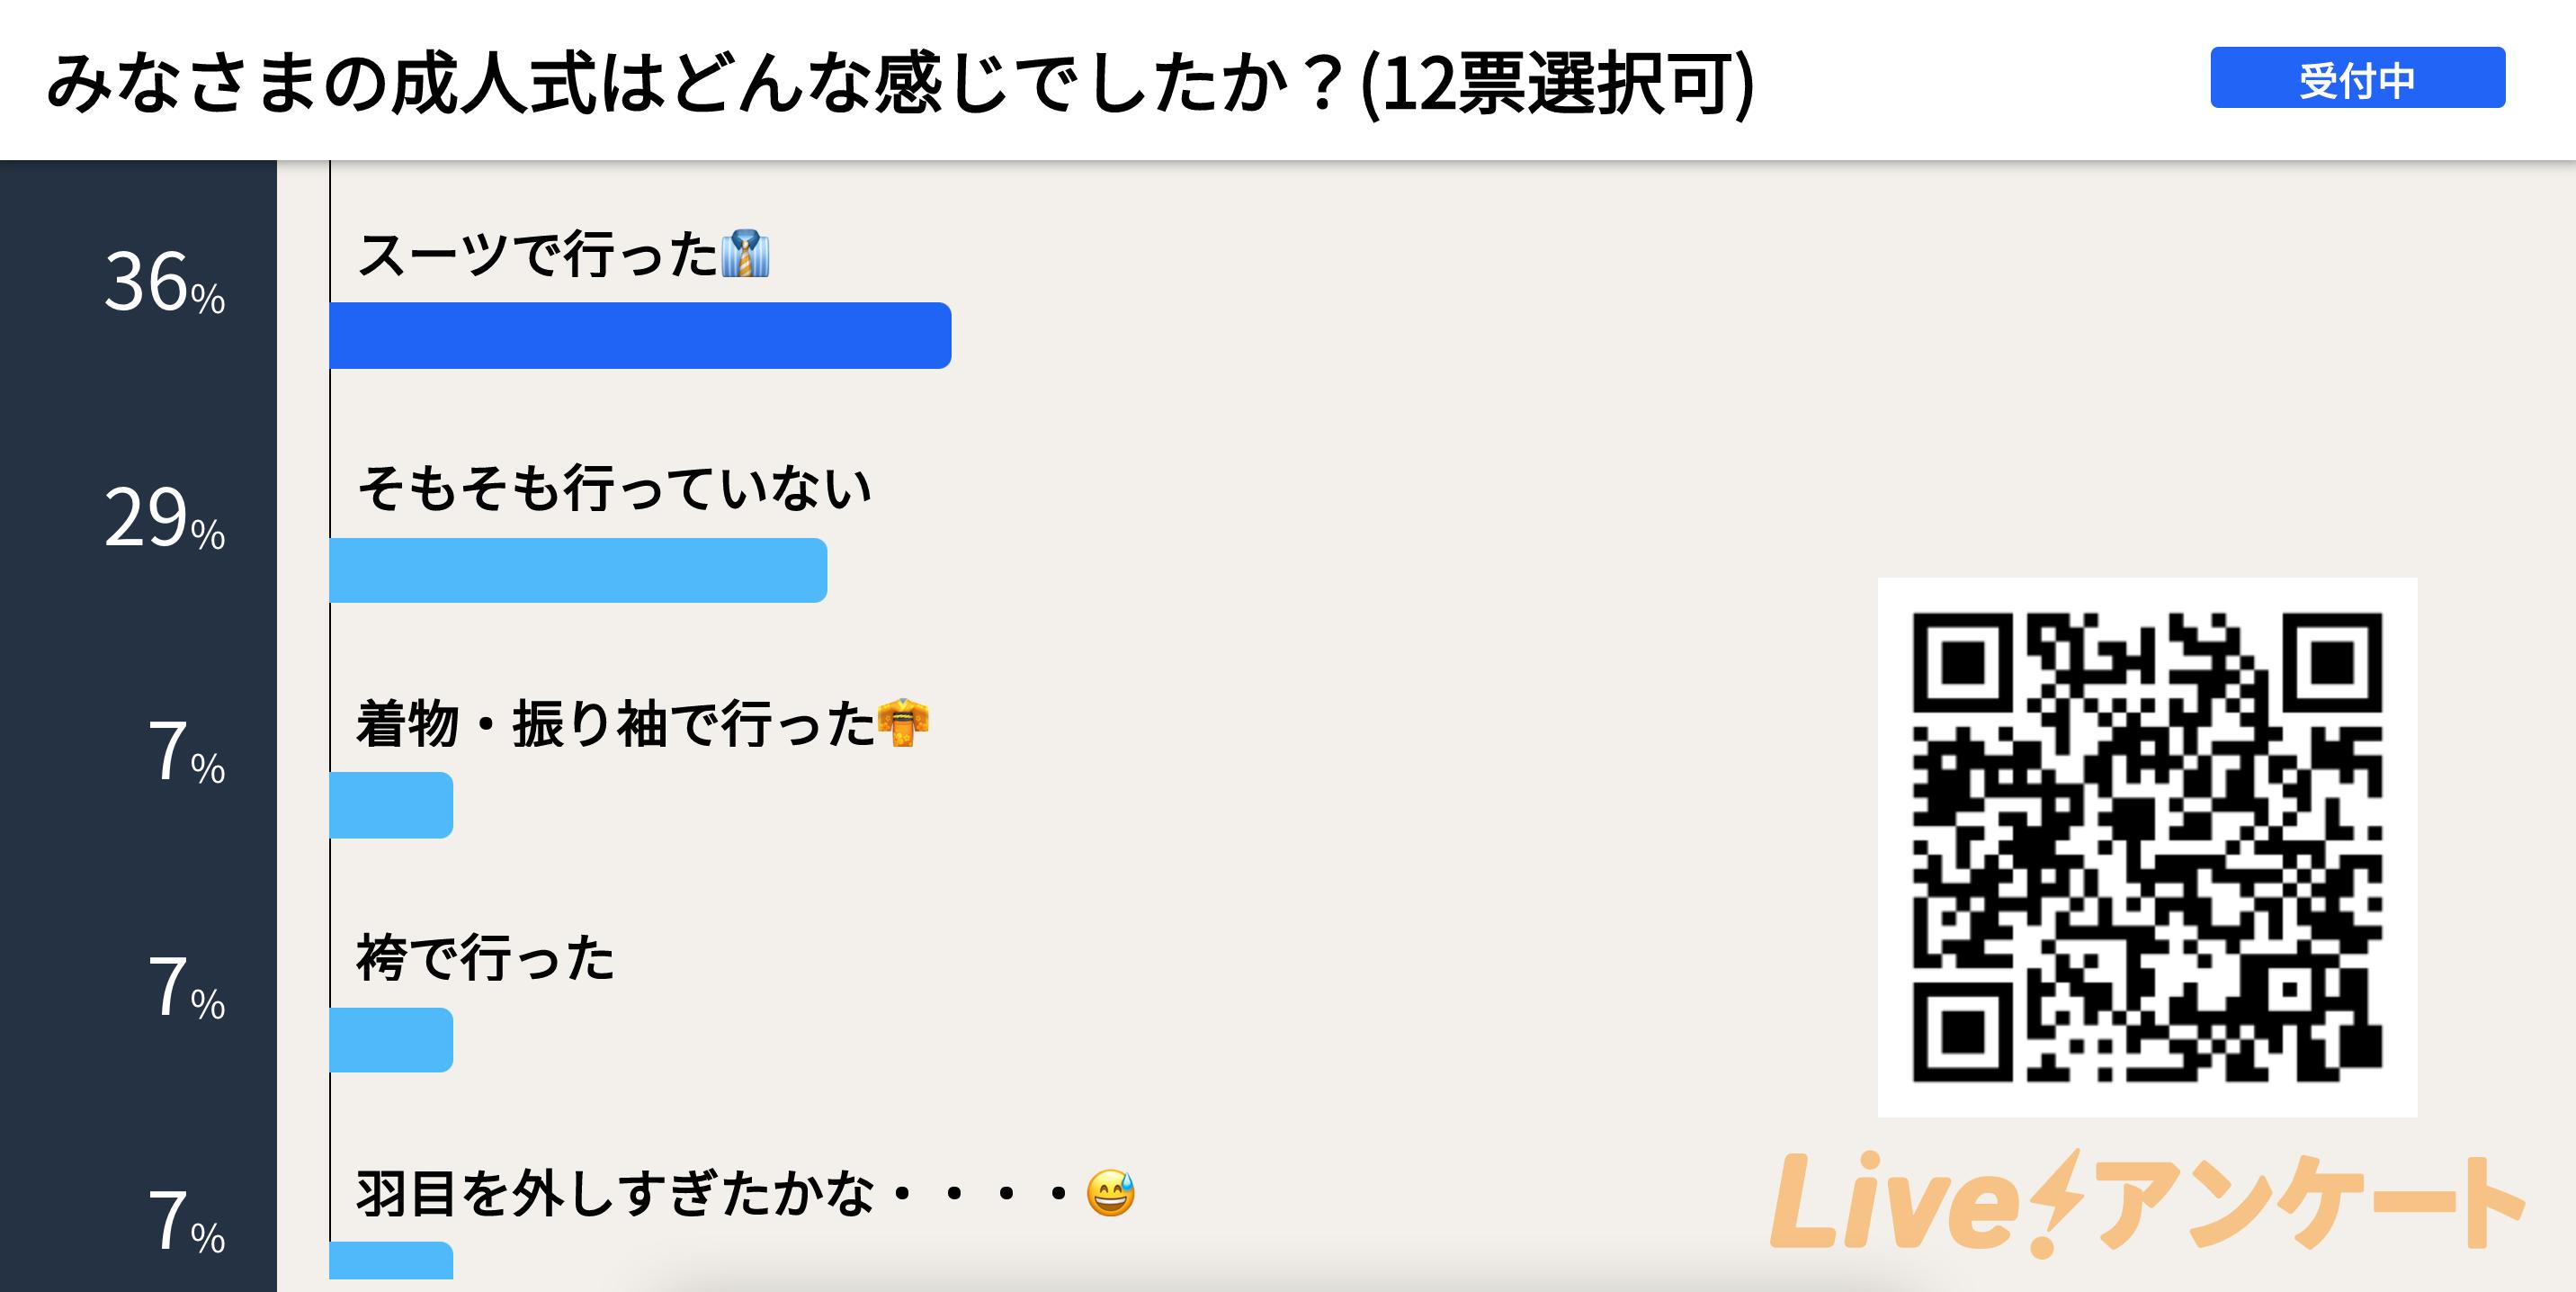 Live!アンケート